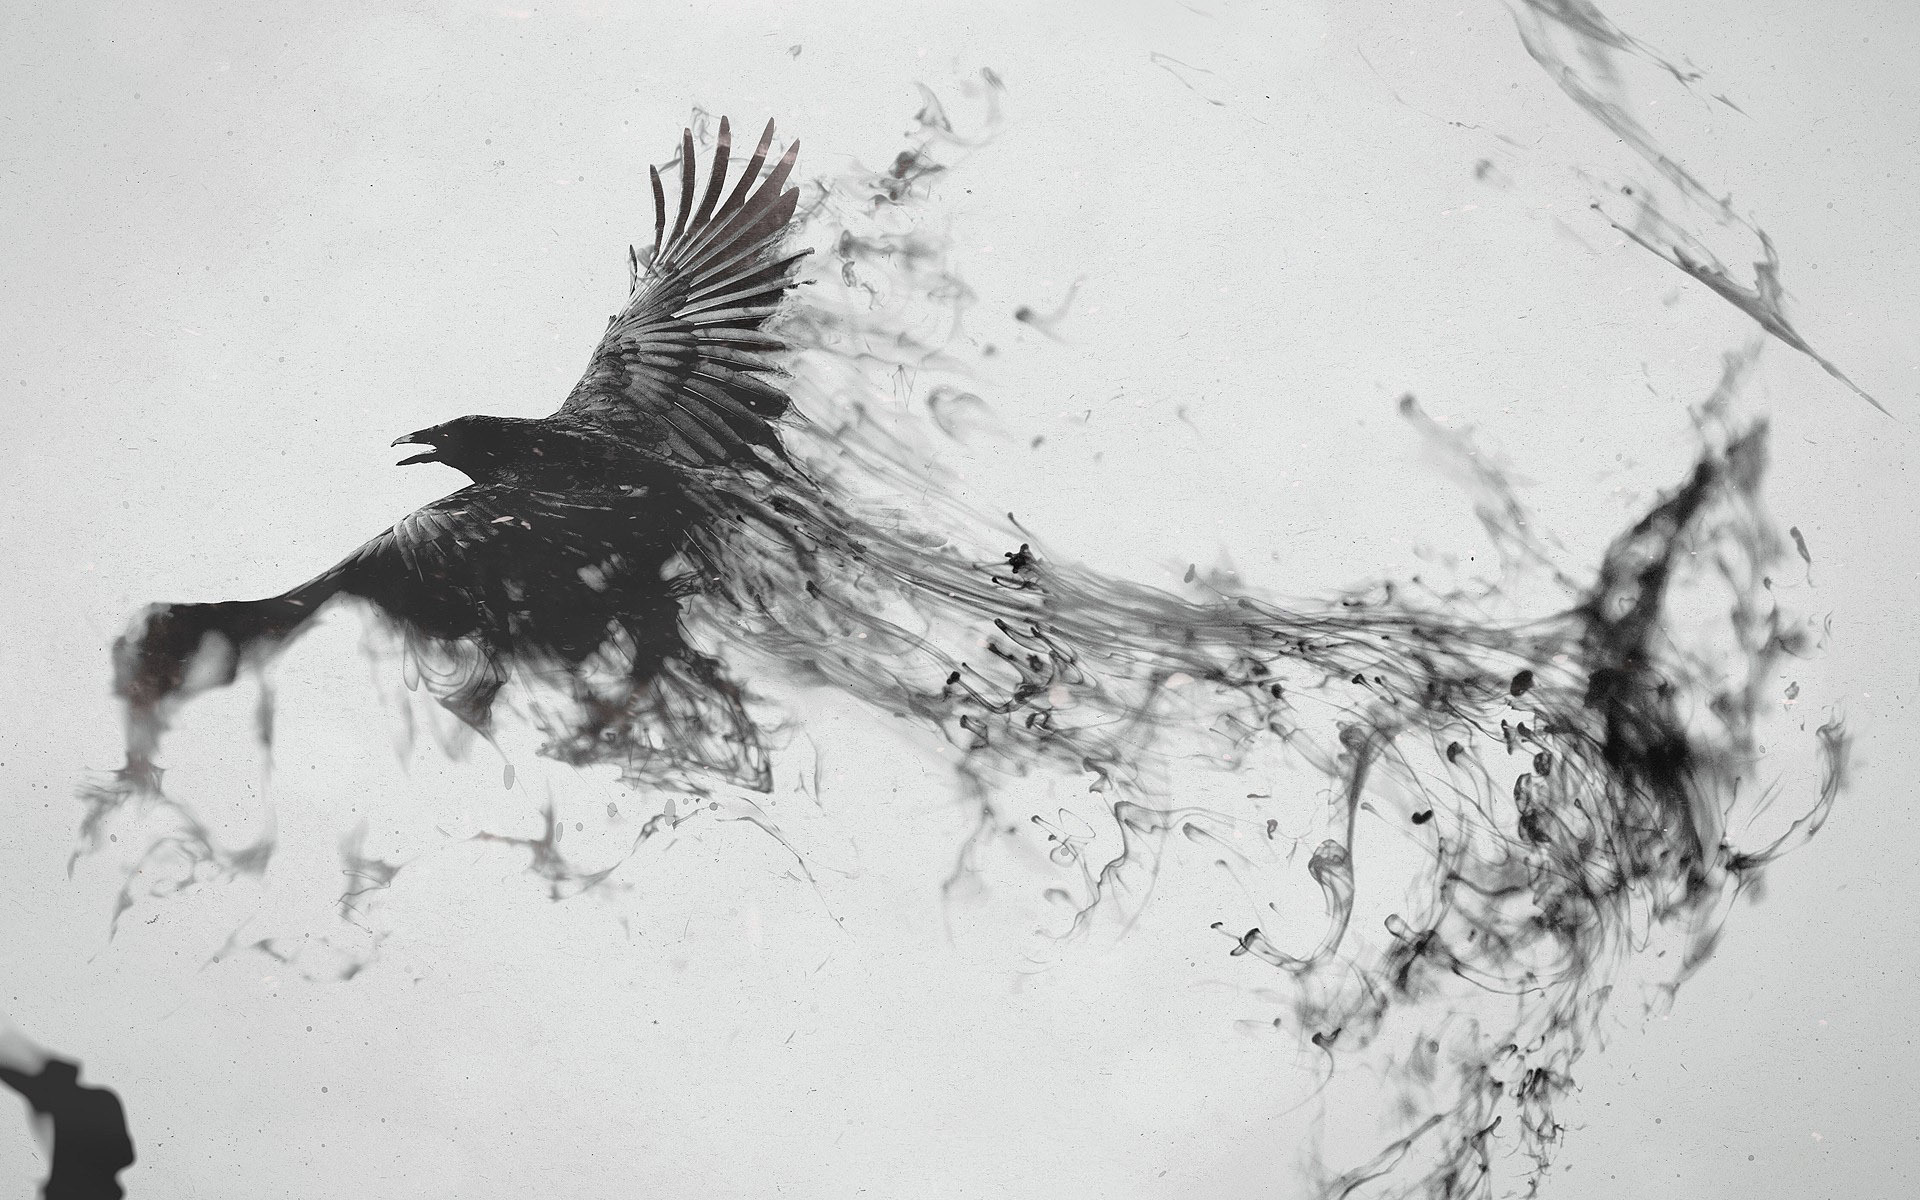 raven flying up black water art fulls creen 1920x1200